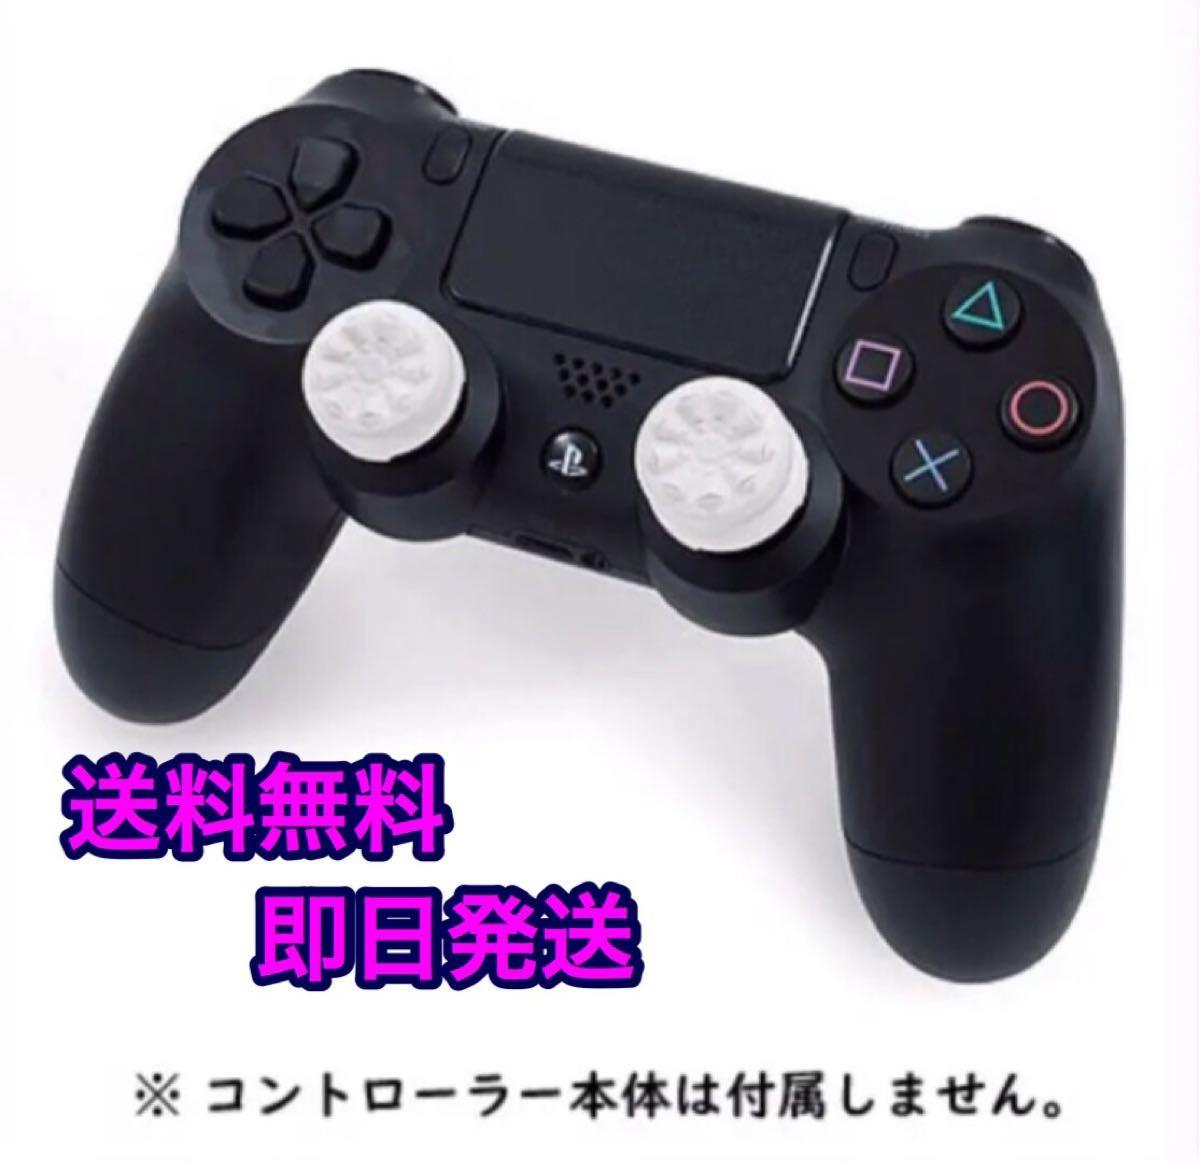 PS4 SPFフリーク ギャラクシー ホワイト